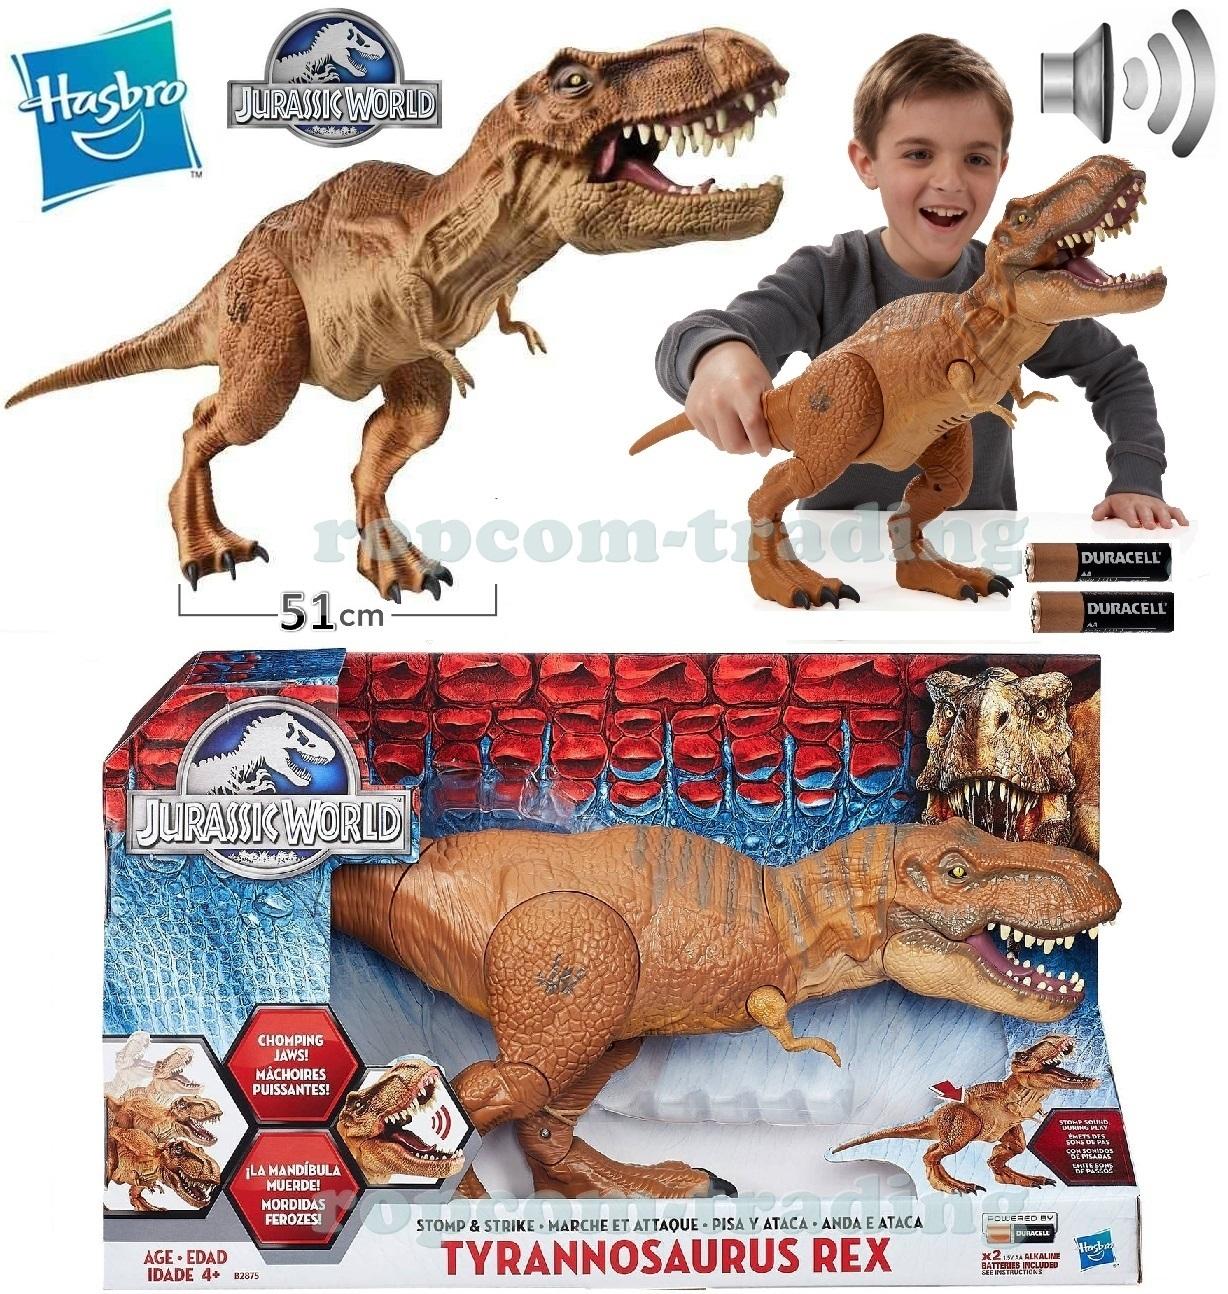 6a1b7385c8695 Duży Dinozaur TREX Jurassic World Interaktywny Dźwięk HASBRO